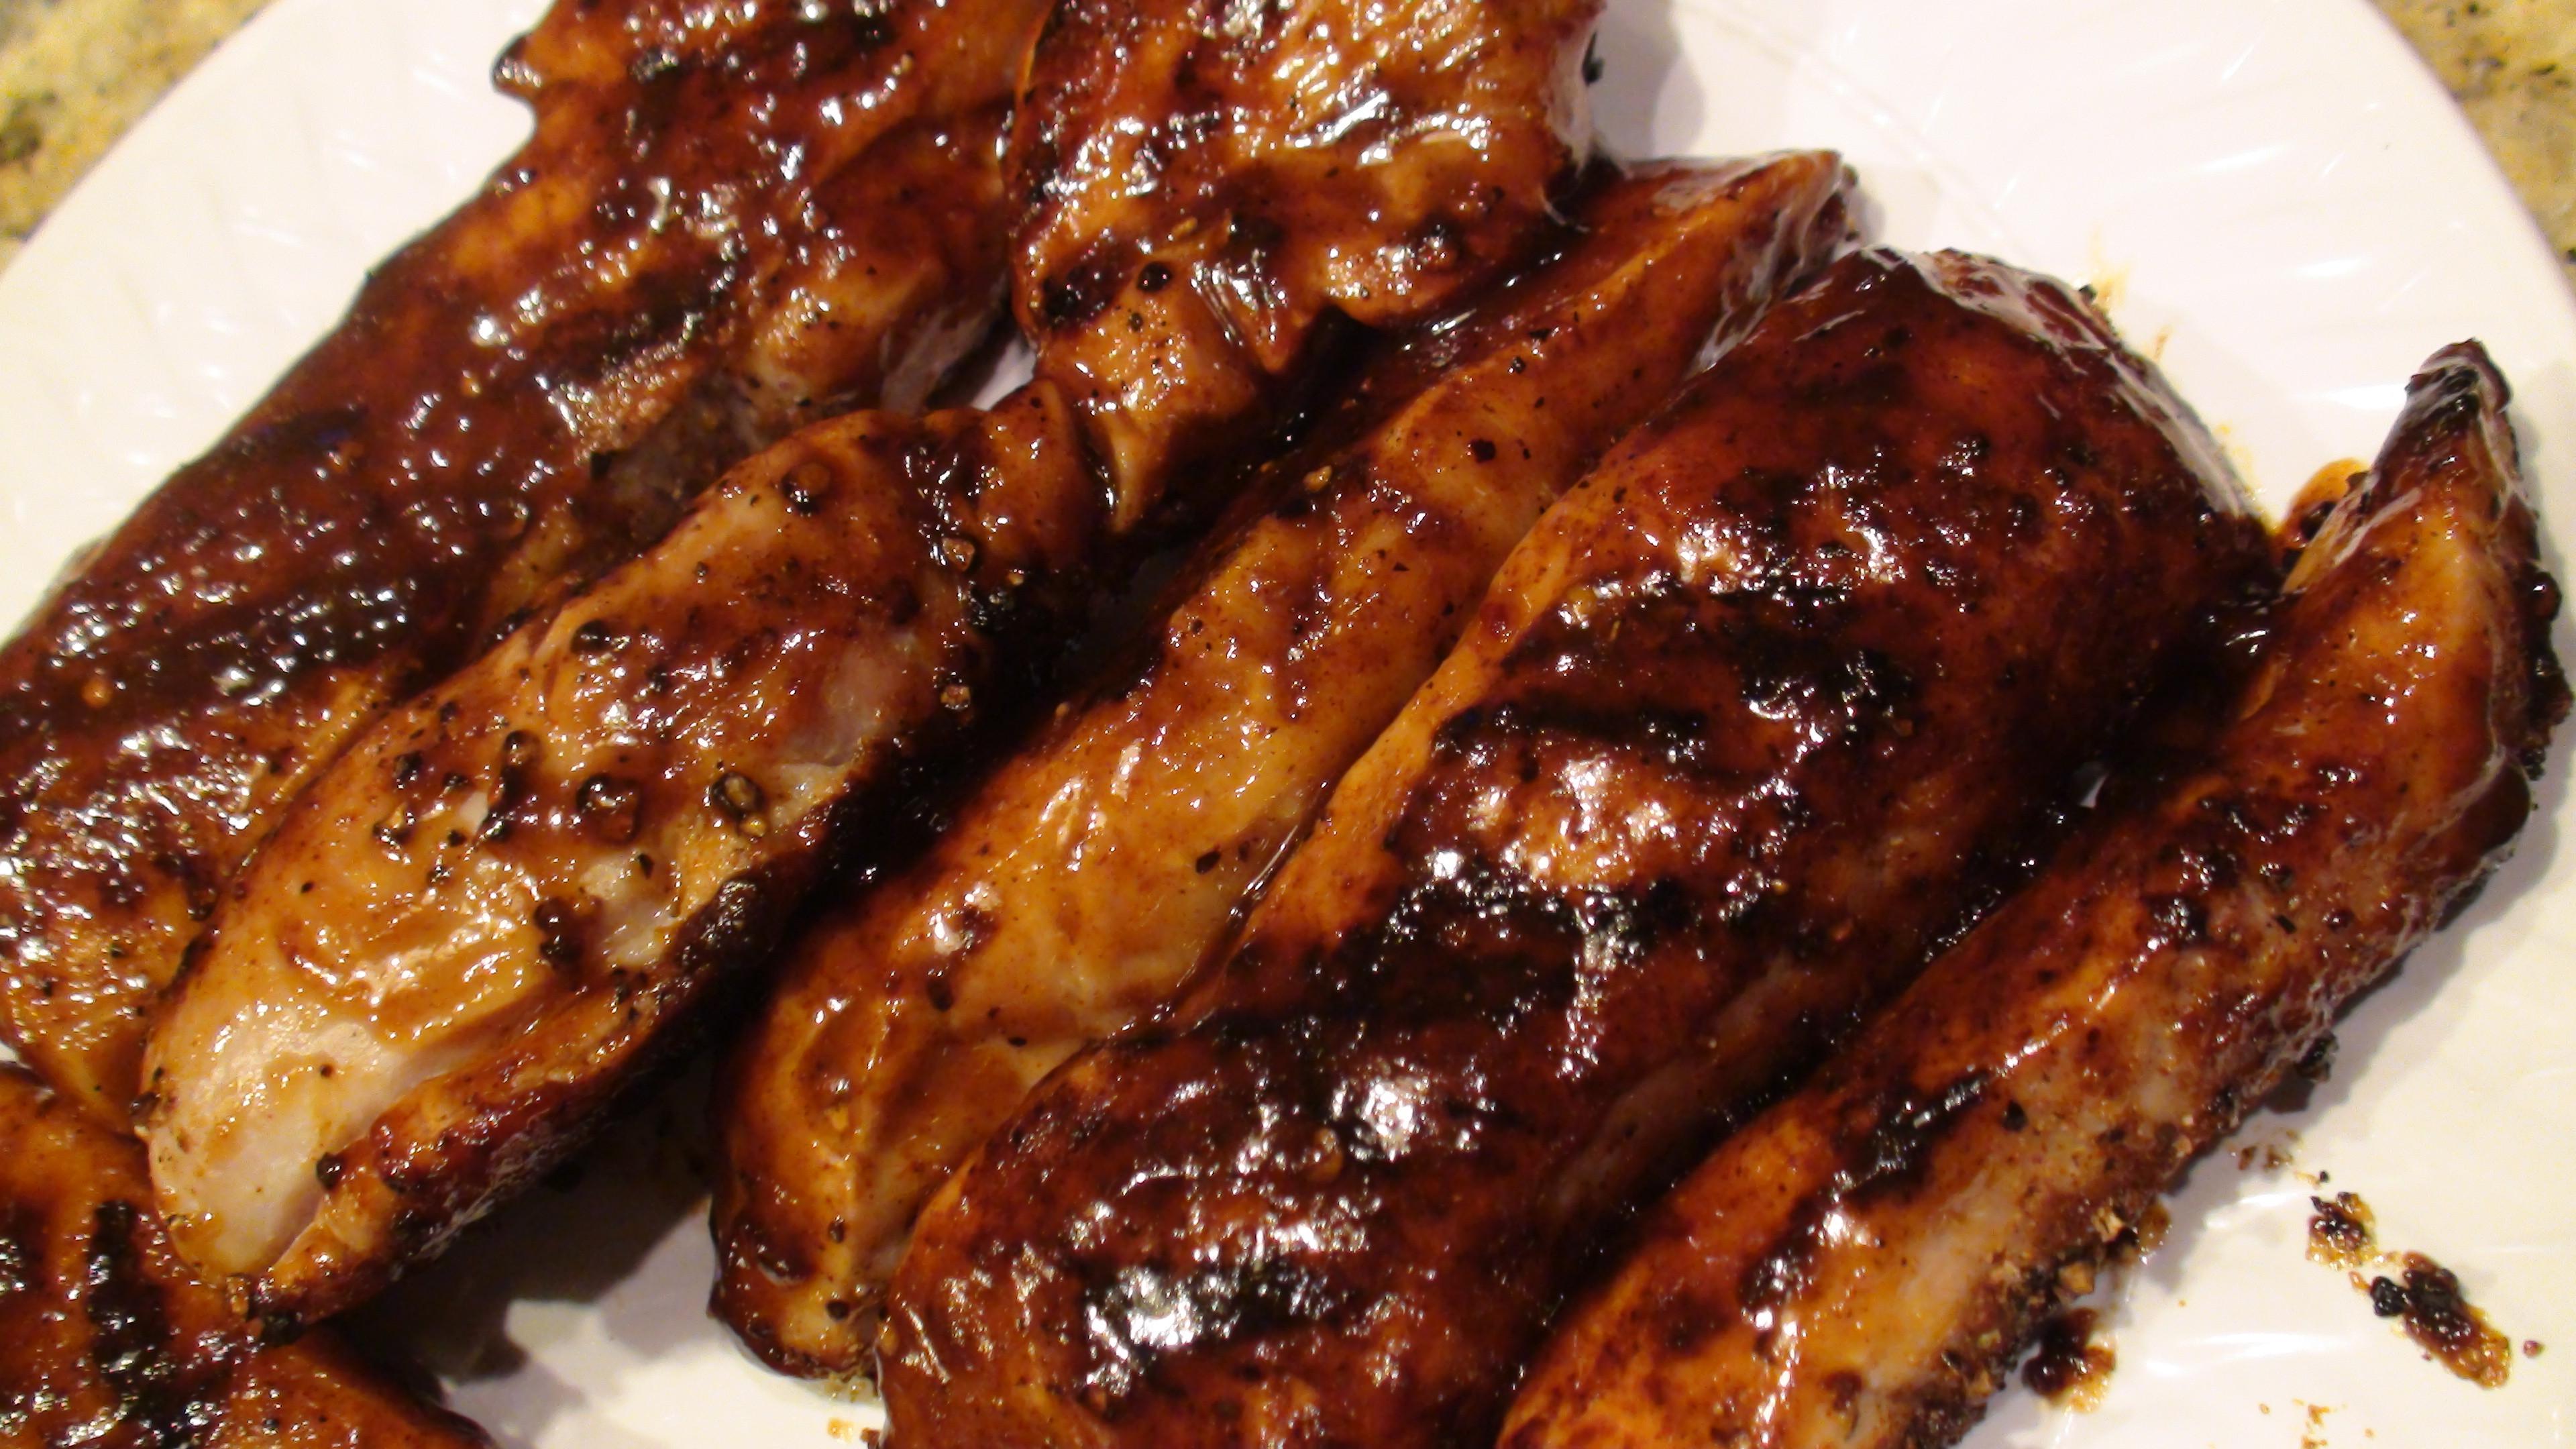 Boneless Pork Ribs Recipe  Country style Boneless Pork Ribs with Chipotle Sauce